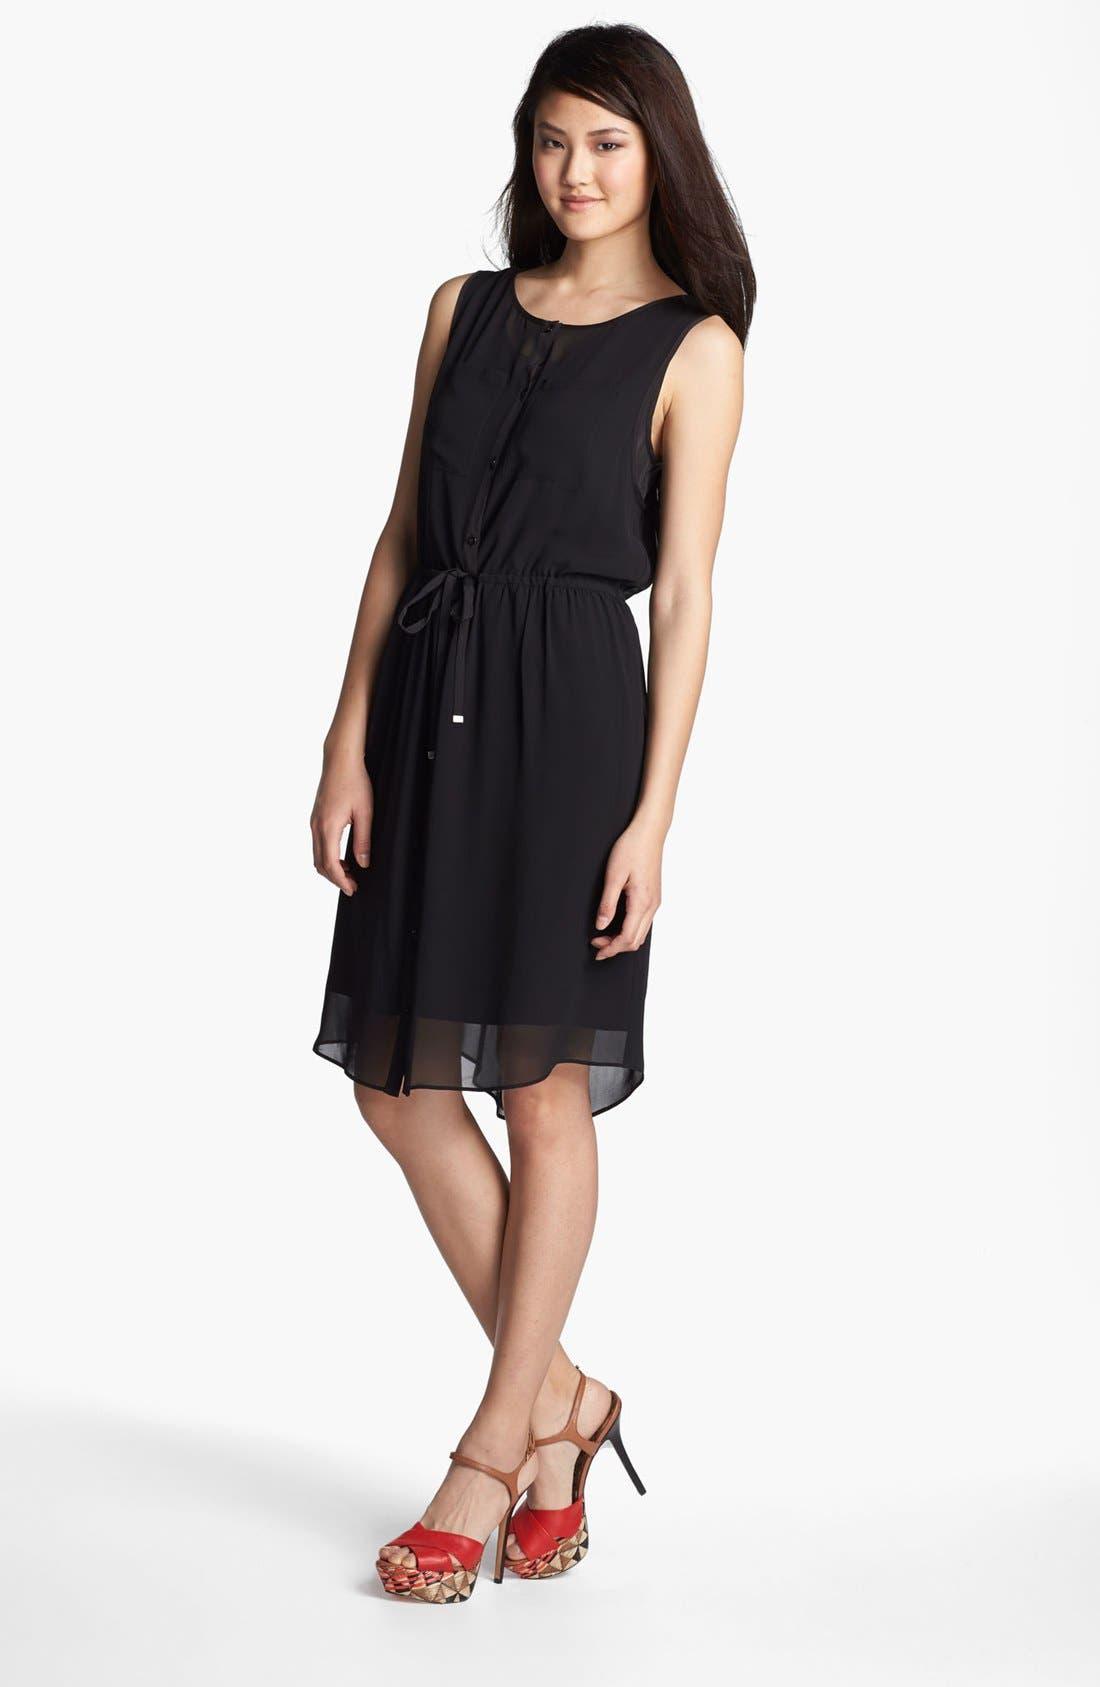 Alternate Image 1 Selected - Kenneth Cole New York 'Amy' Sleeveless Drawstring  Dress